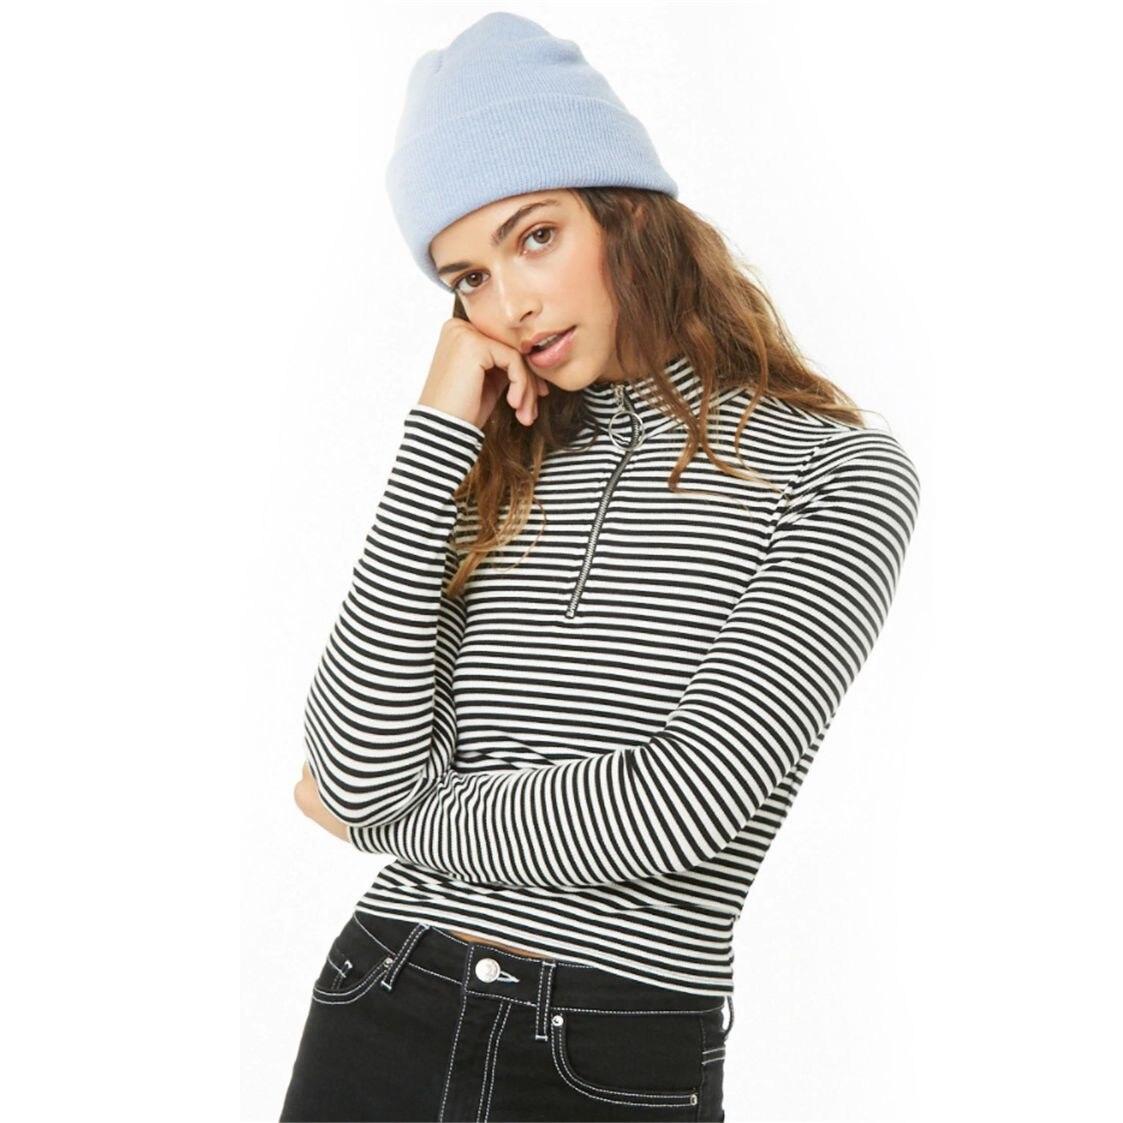 Women's Stripe Zipper Half Turtleneck Pullover Skinny Fitted Short Shirts Femme Long Sleeve Slim Fashion Tops